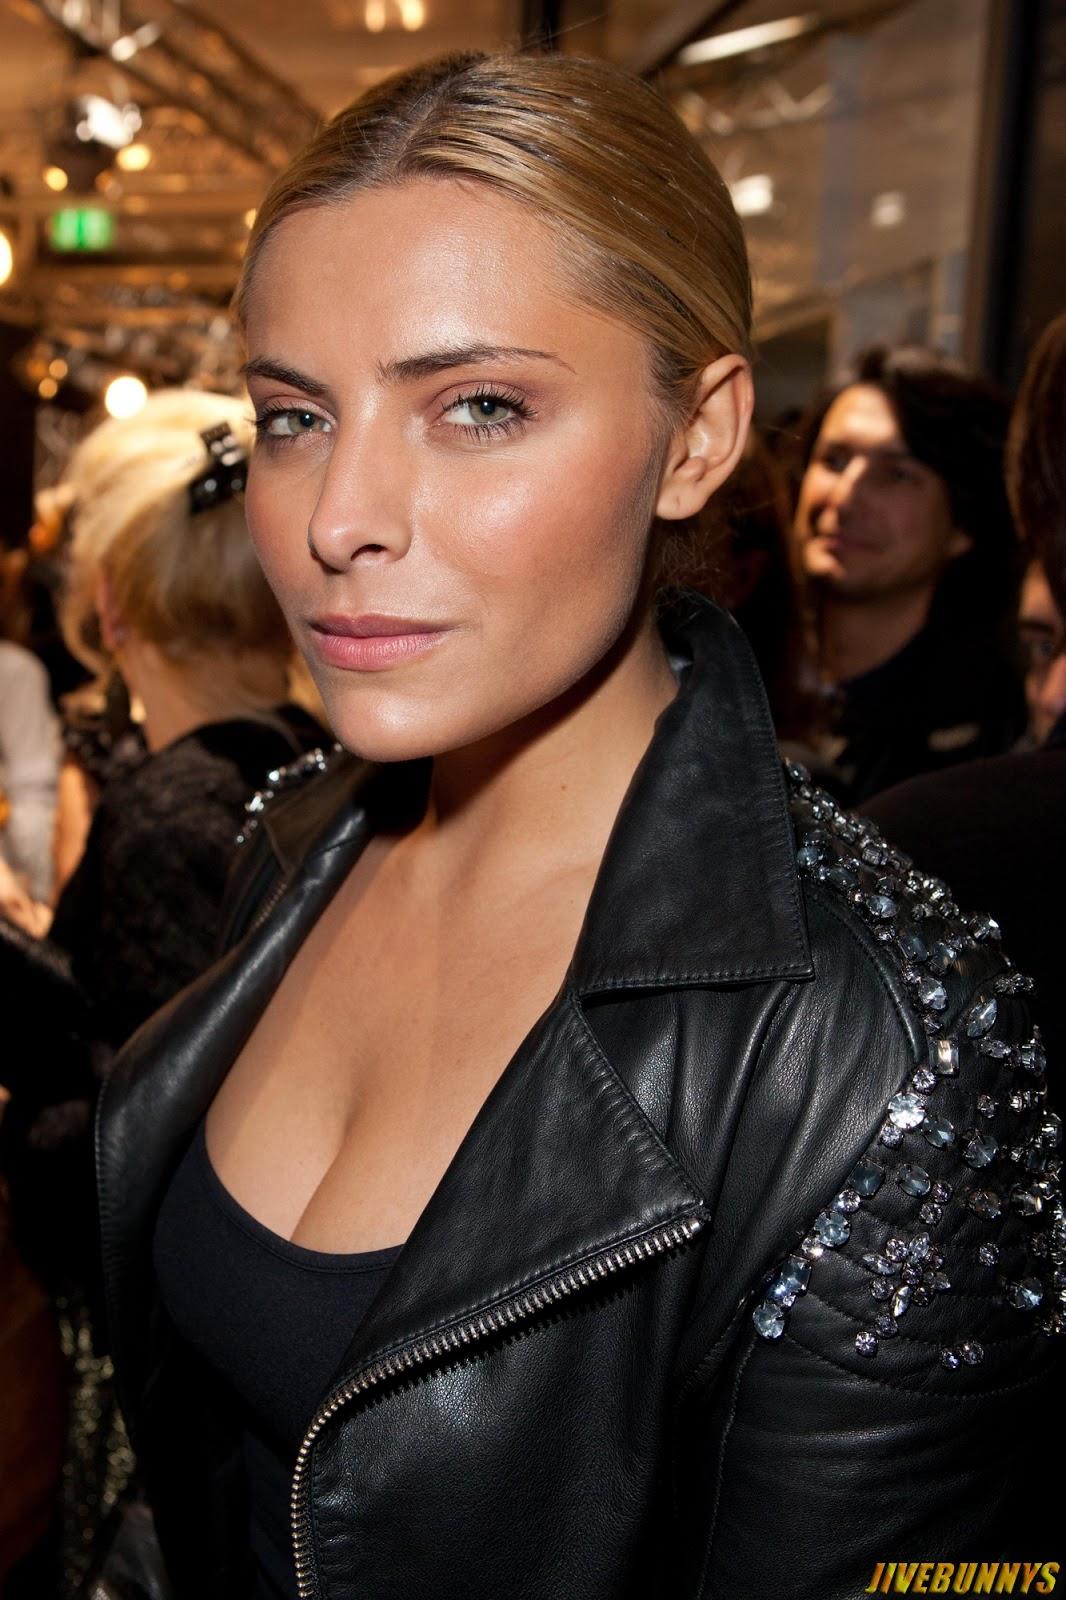 Jivebunnys Female Celebrity Picture Gallery: Sophia ... Jennifer Aniston Movies